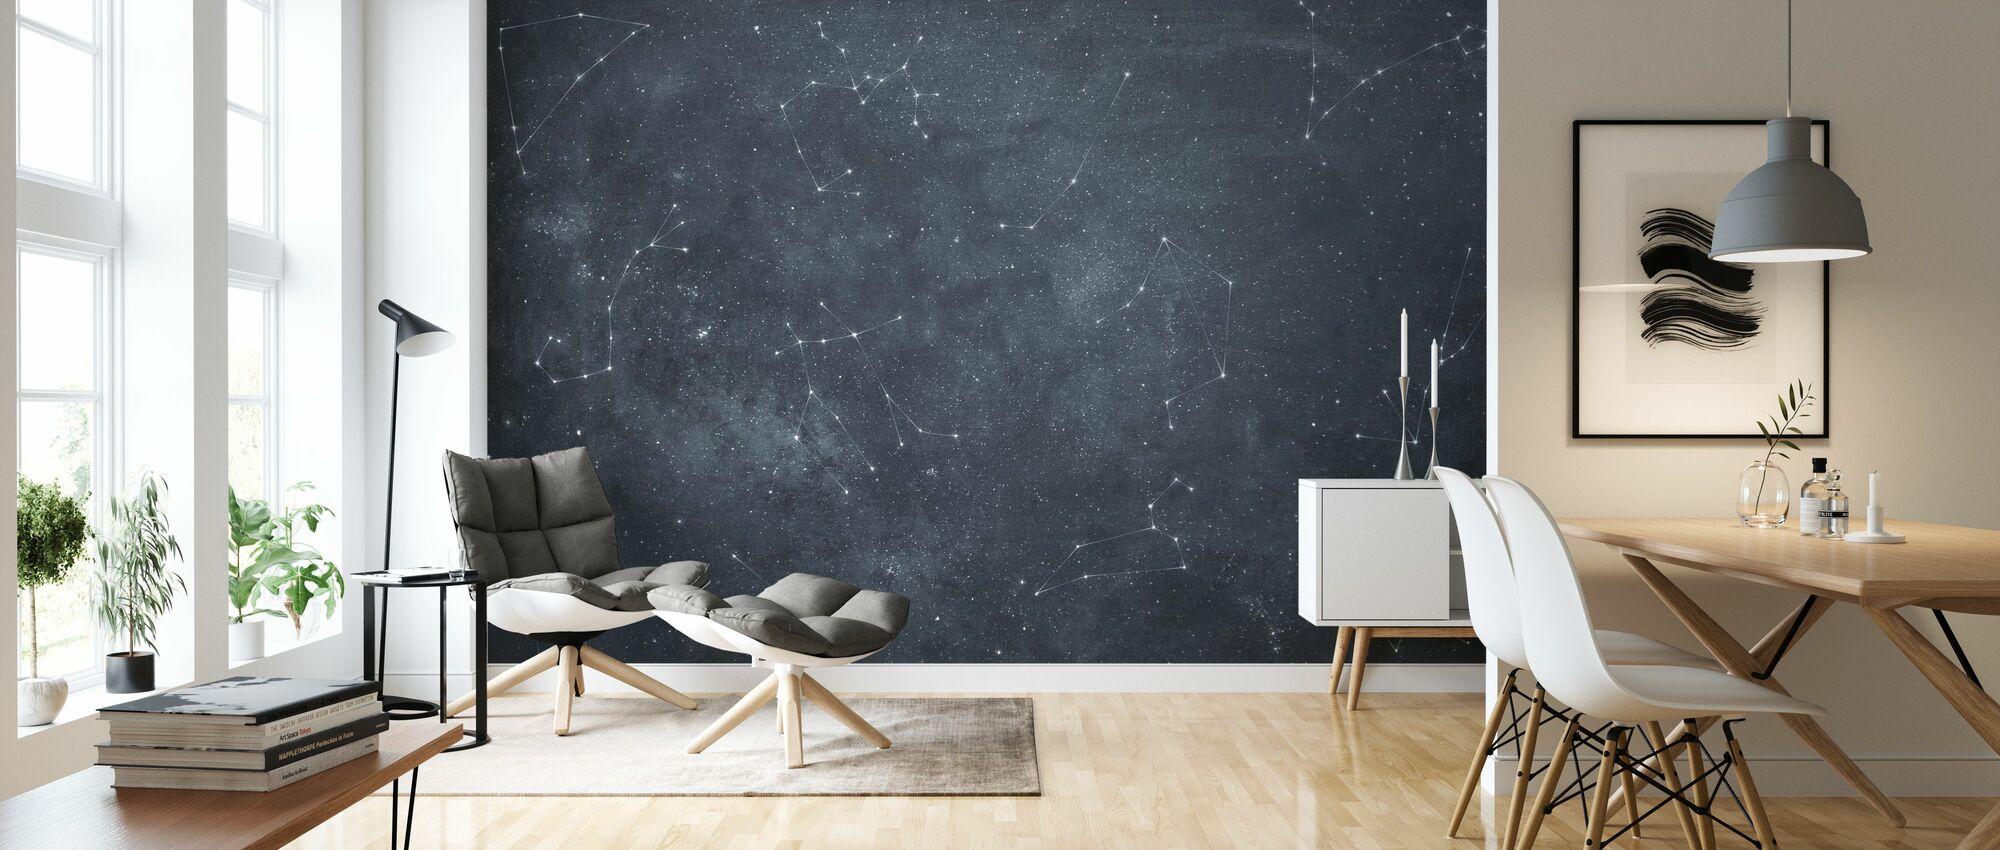 Zoodiac Sky IIII - Wallpaper - Living Room